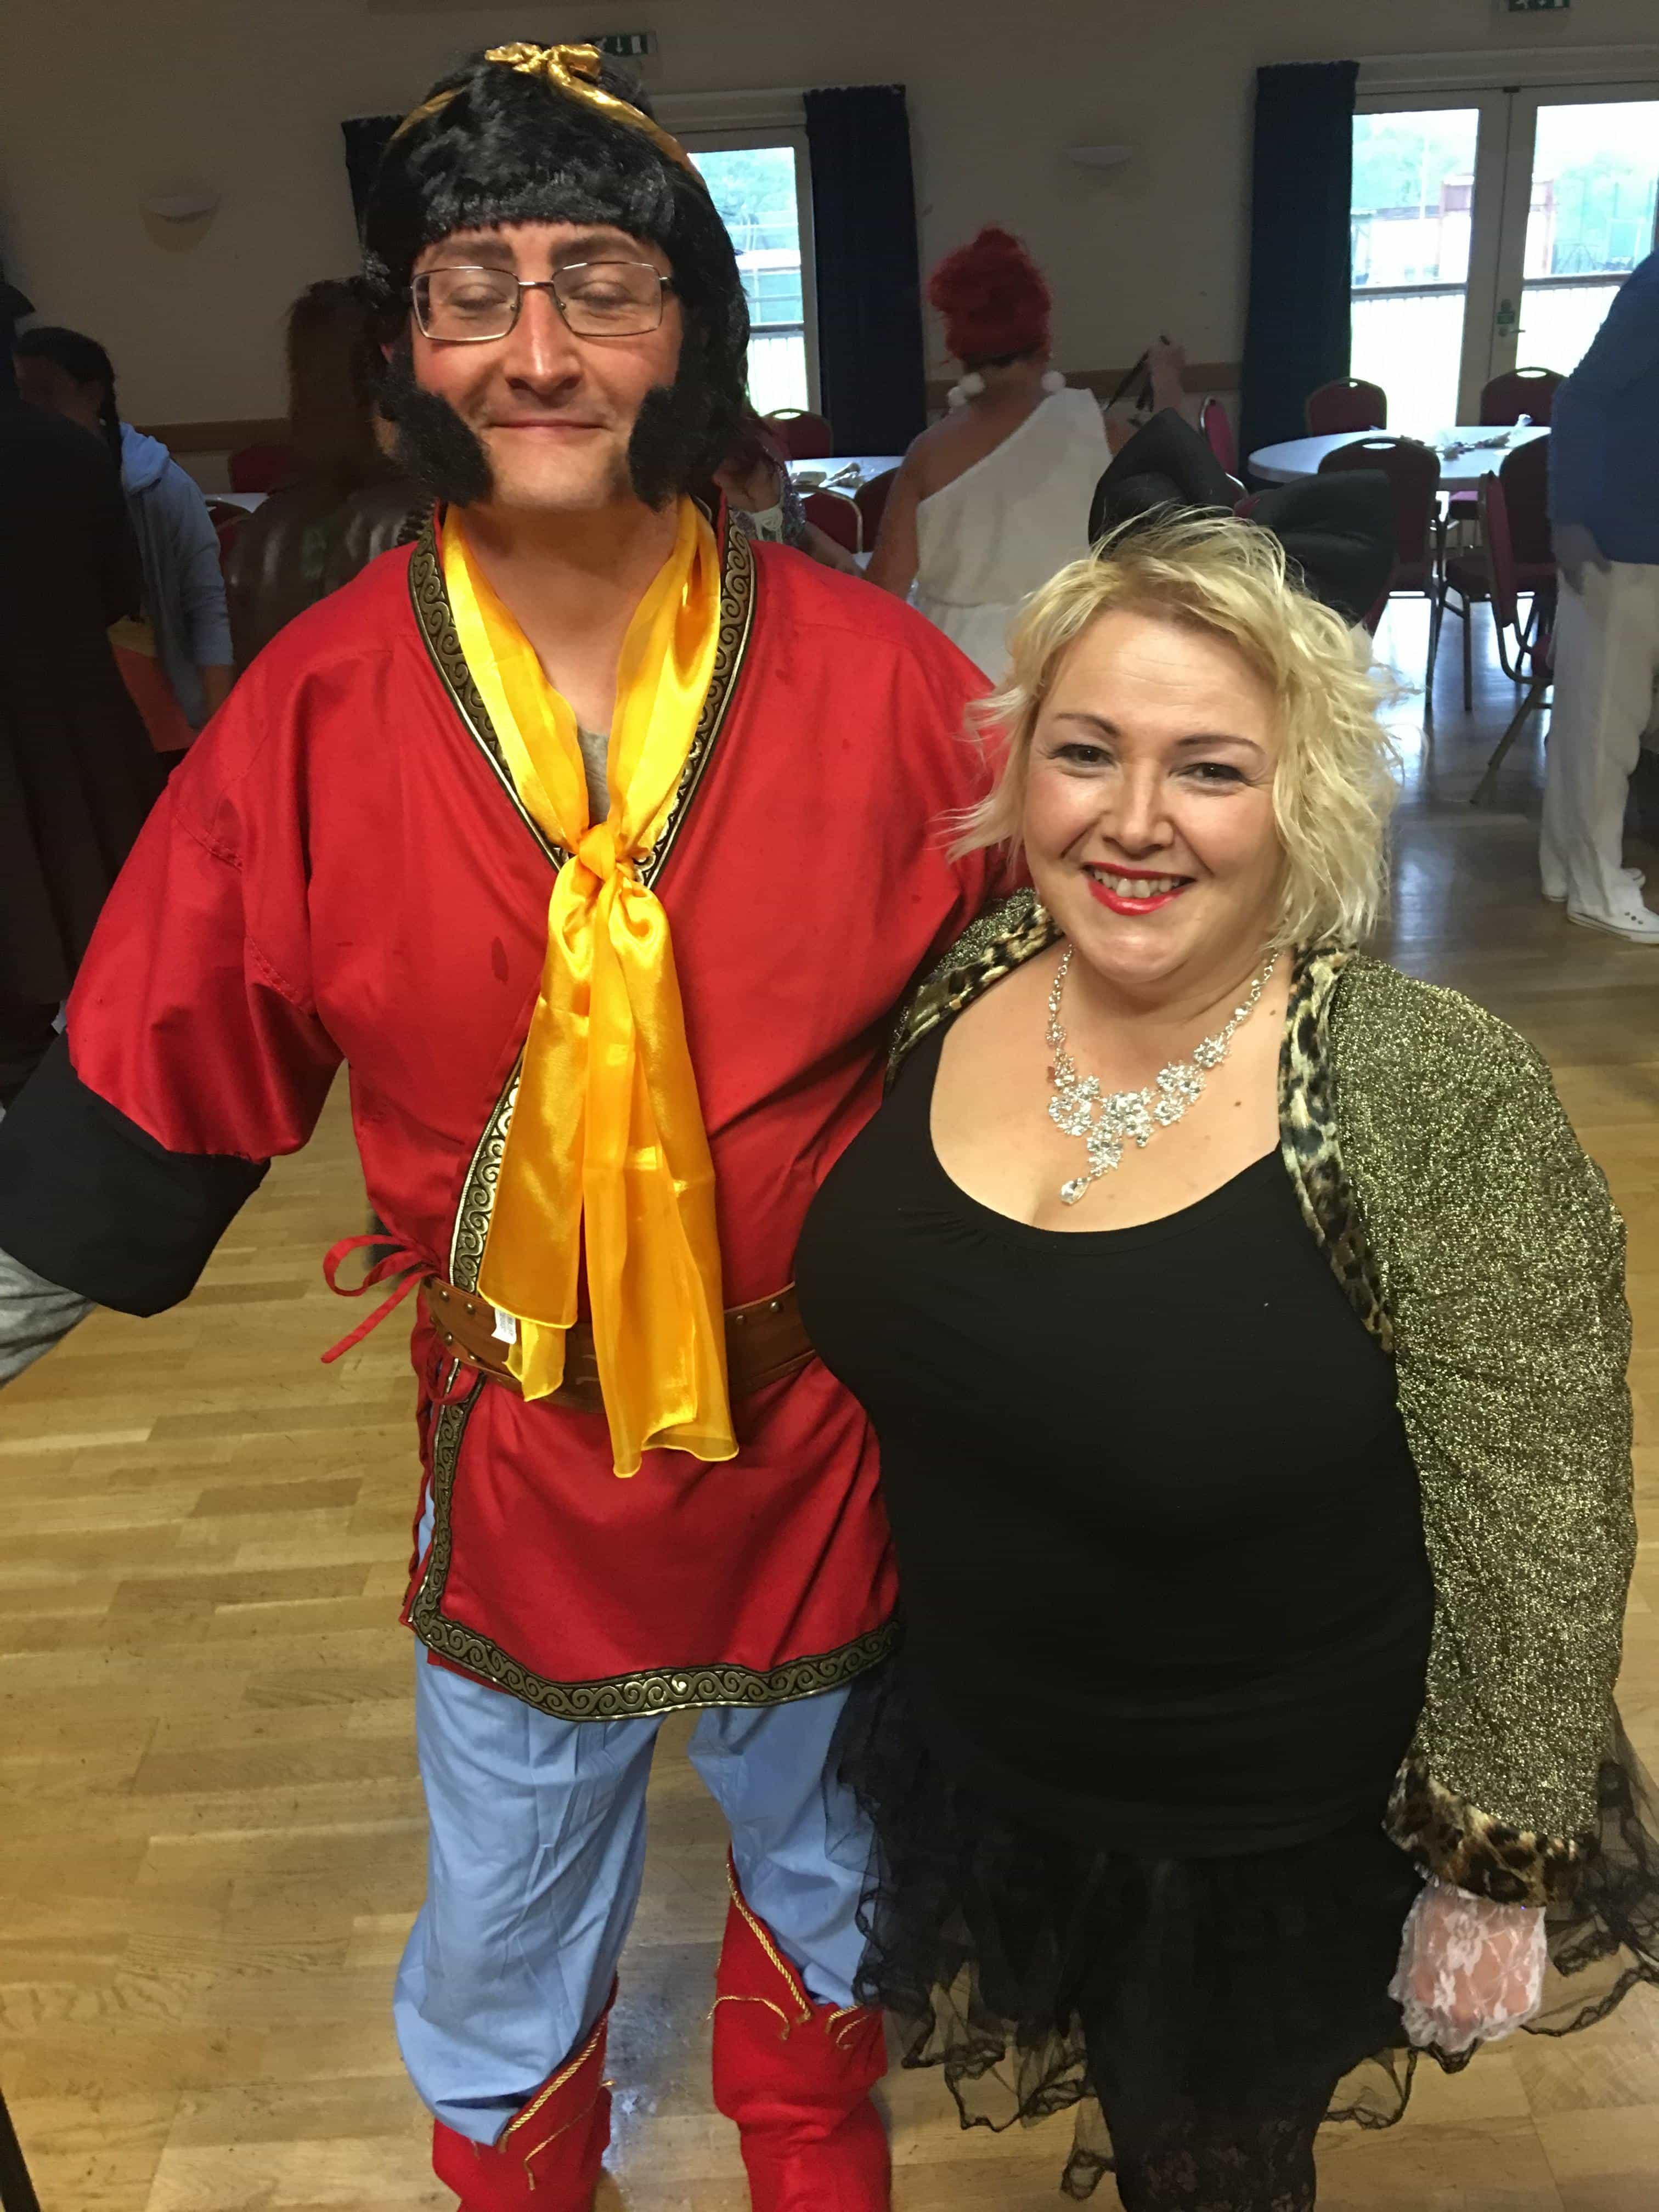 Cookley Sports Club 80s Themed Wedding Chris Mack Specialist Djs Ltd